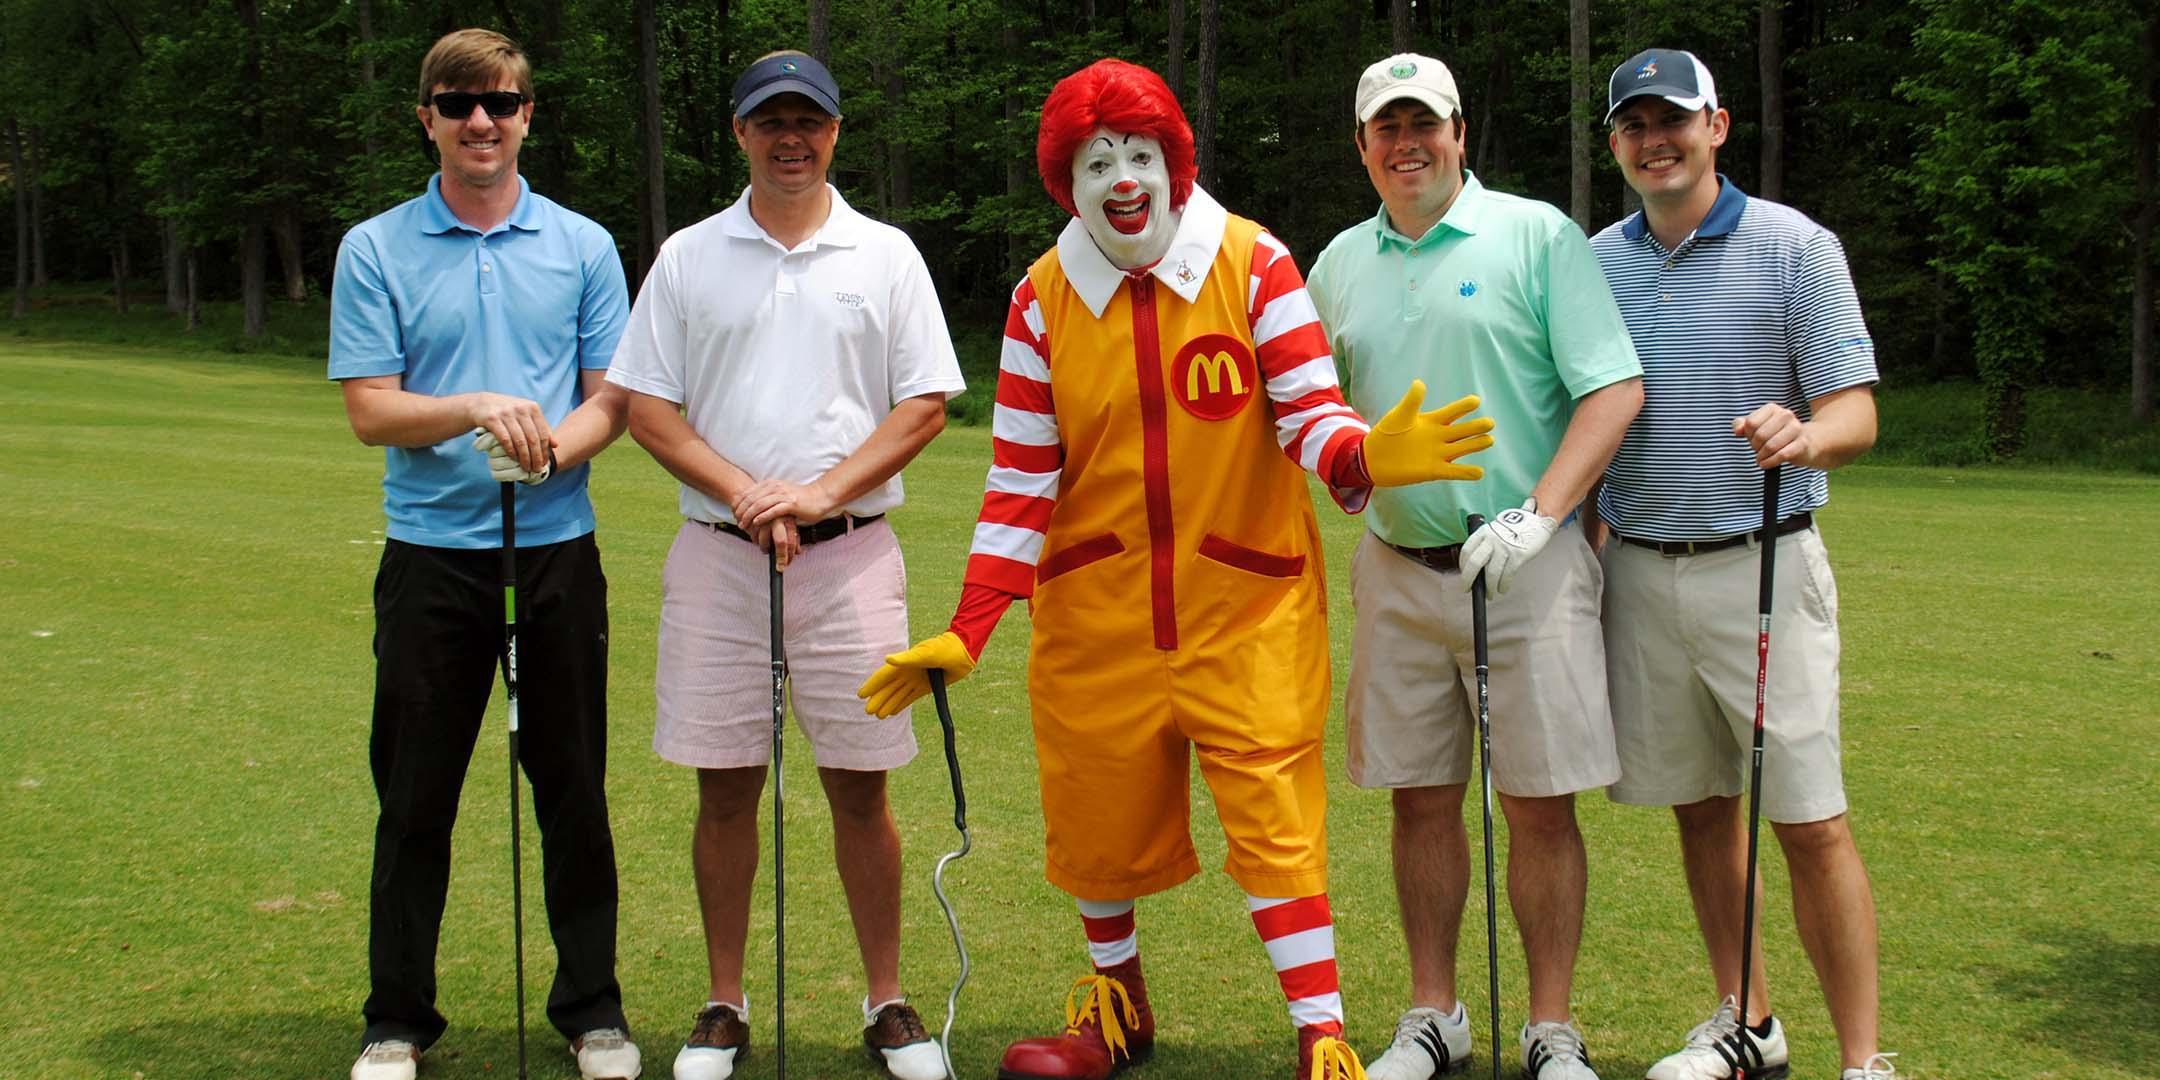 2020 Camp Royall Classic Golf Tournament